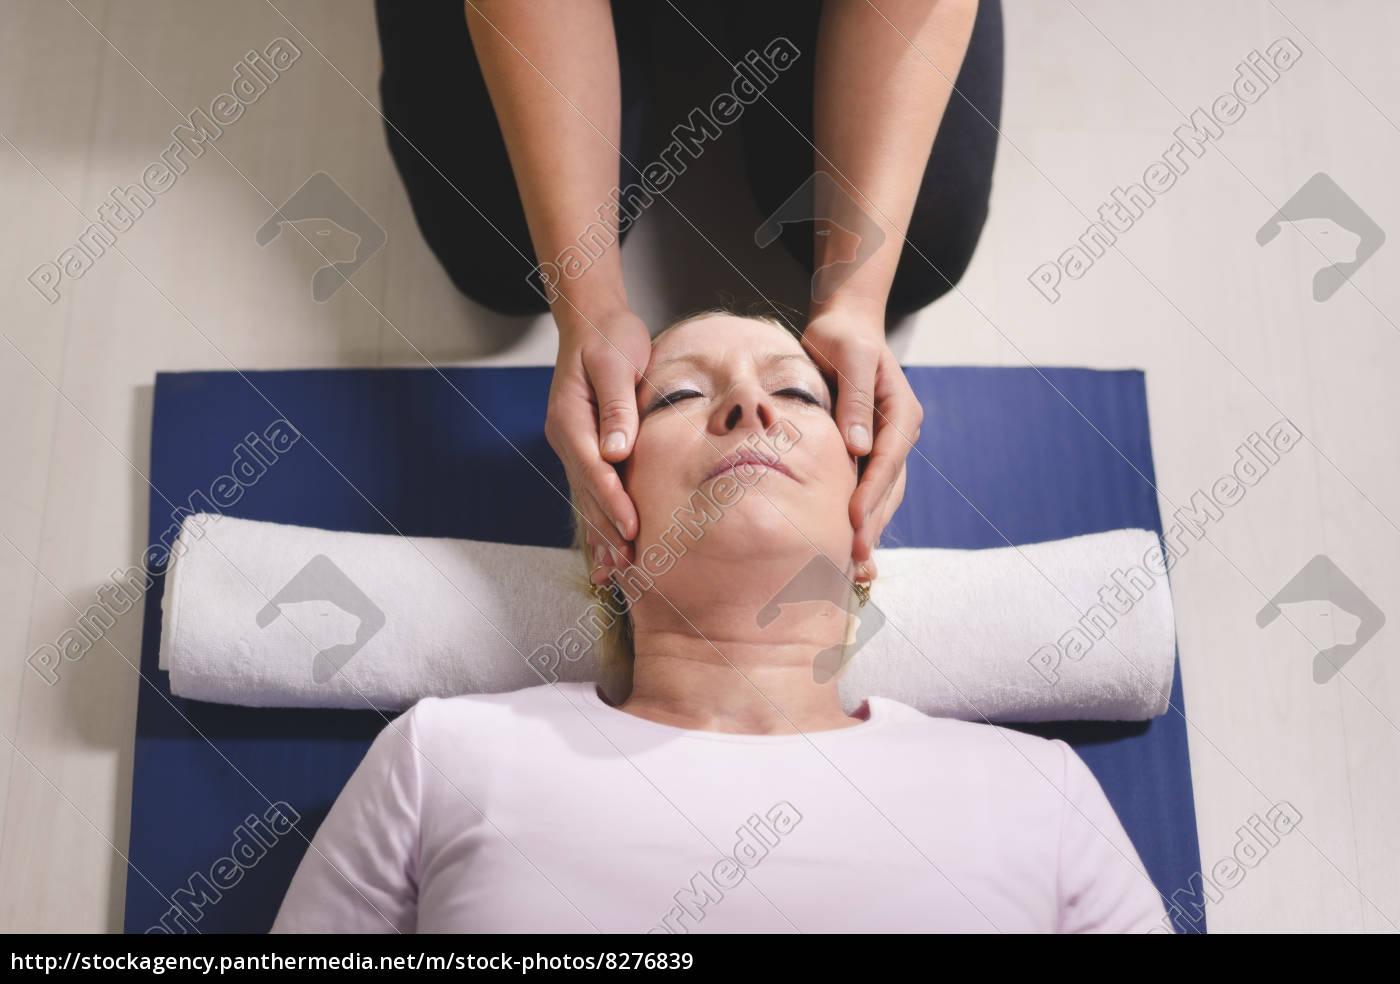 junge, therapeutin, macht, reiki-therapie, an, ältere - 8276839